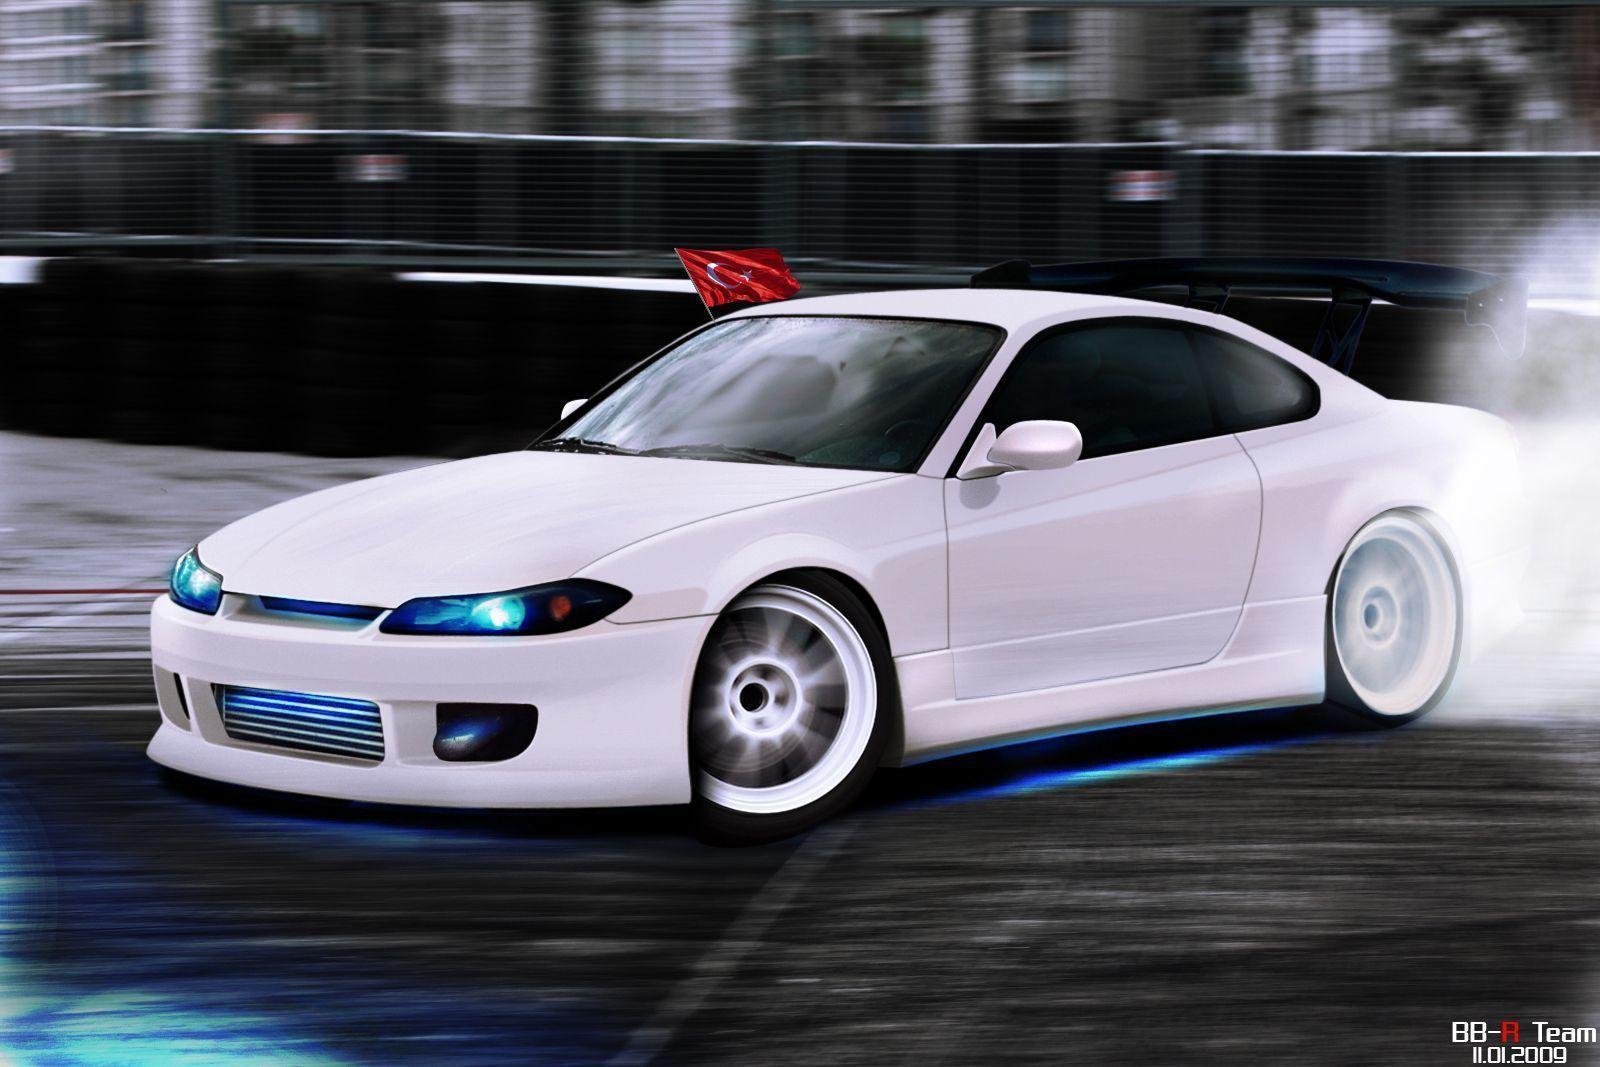 FeatureThis: An S13 Goes Full Kustom - Speedhunters